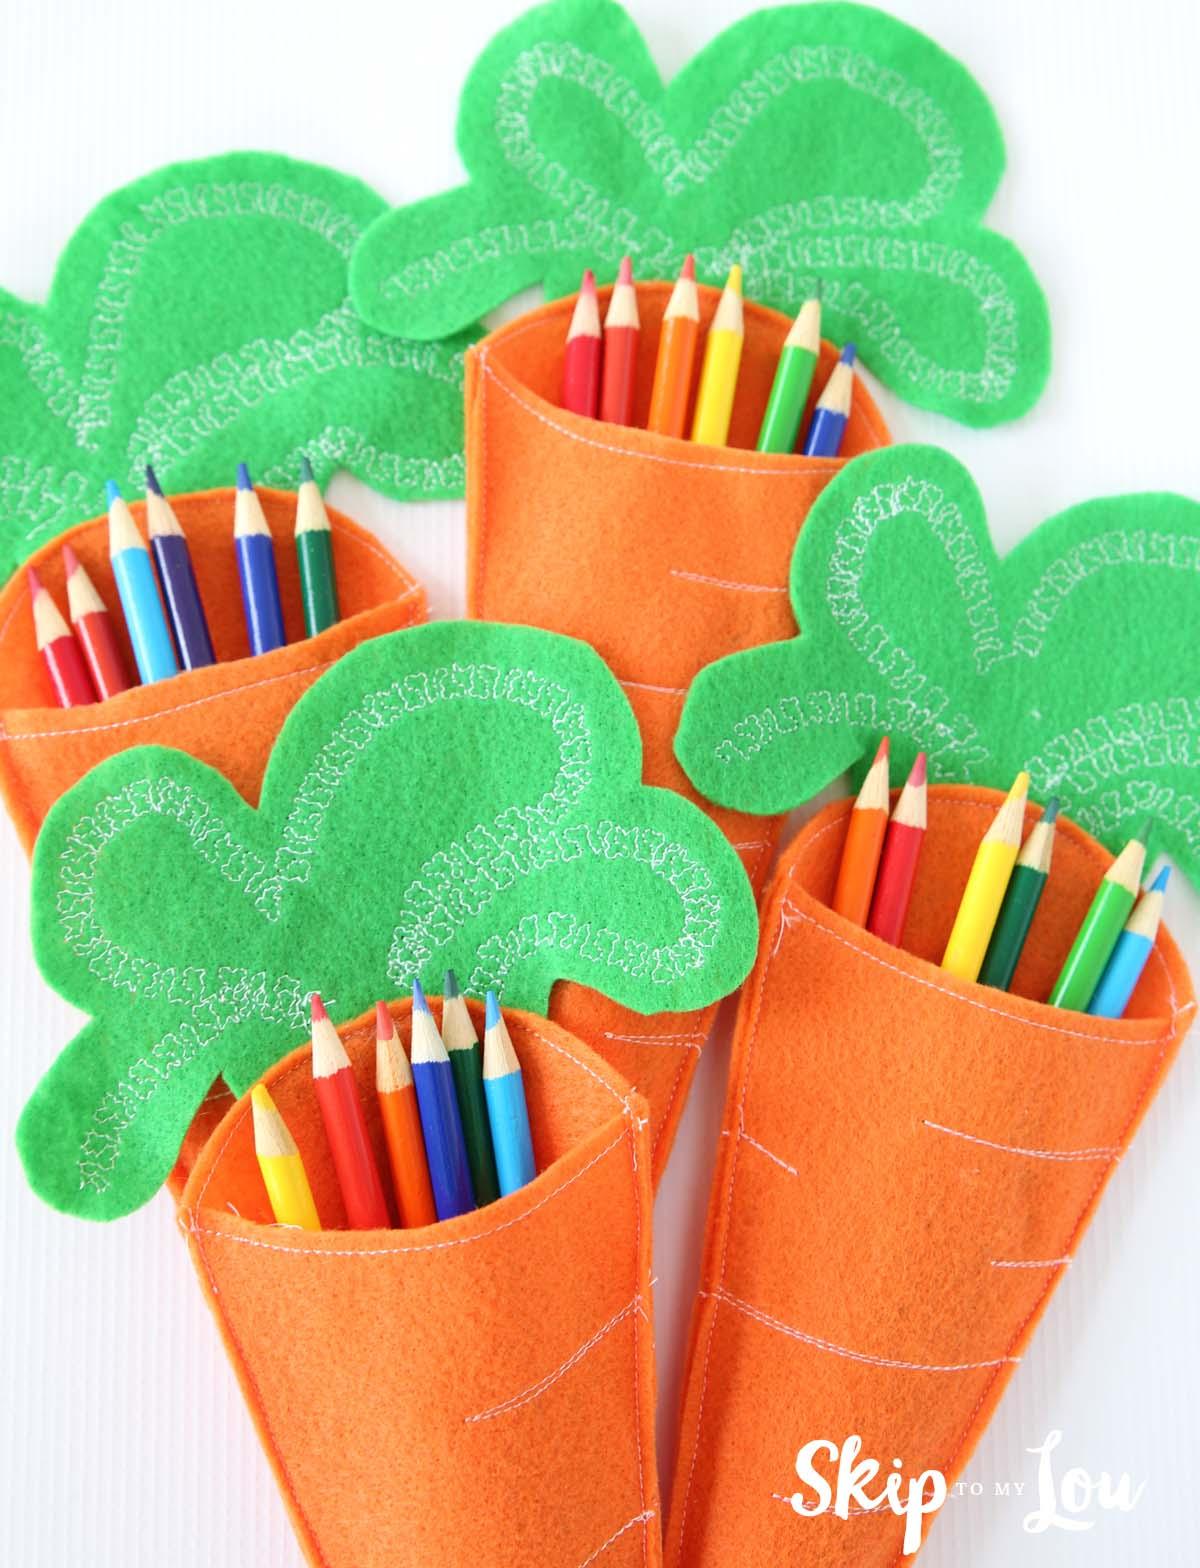 Felt Carrot Pencil Holders